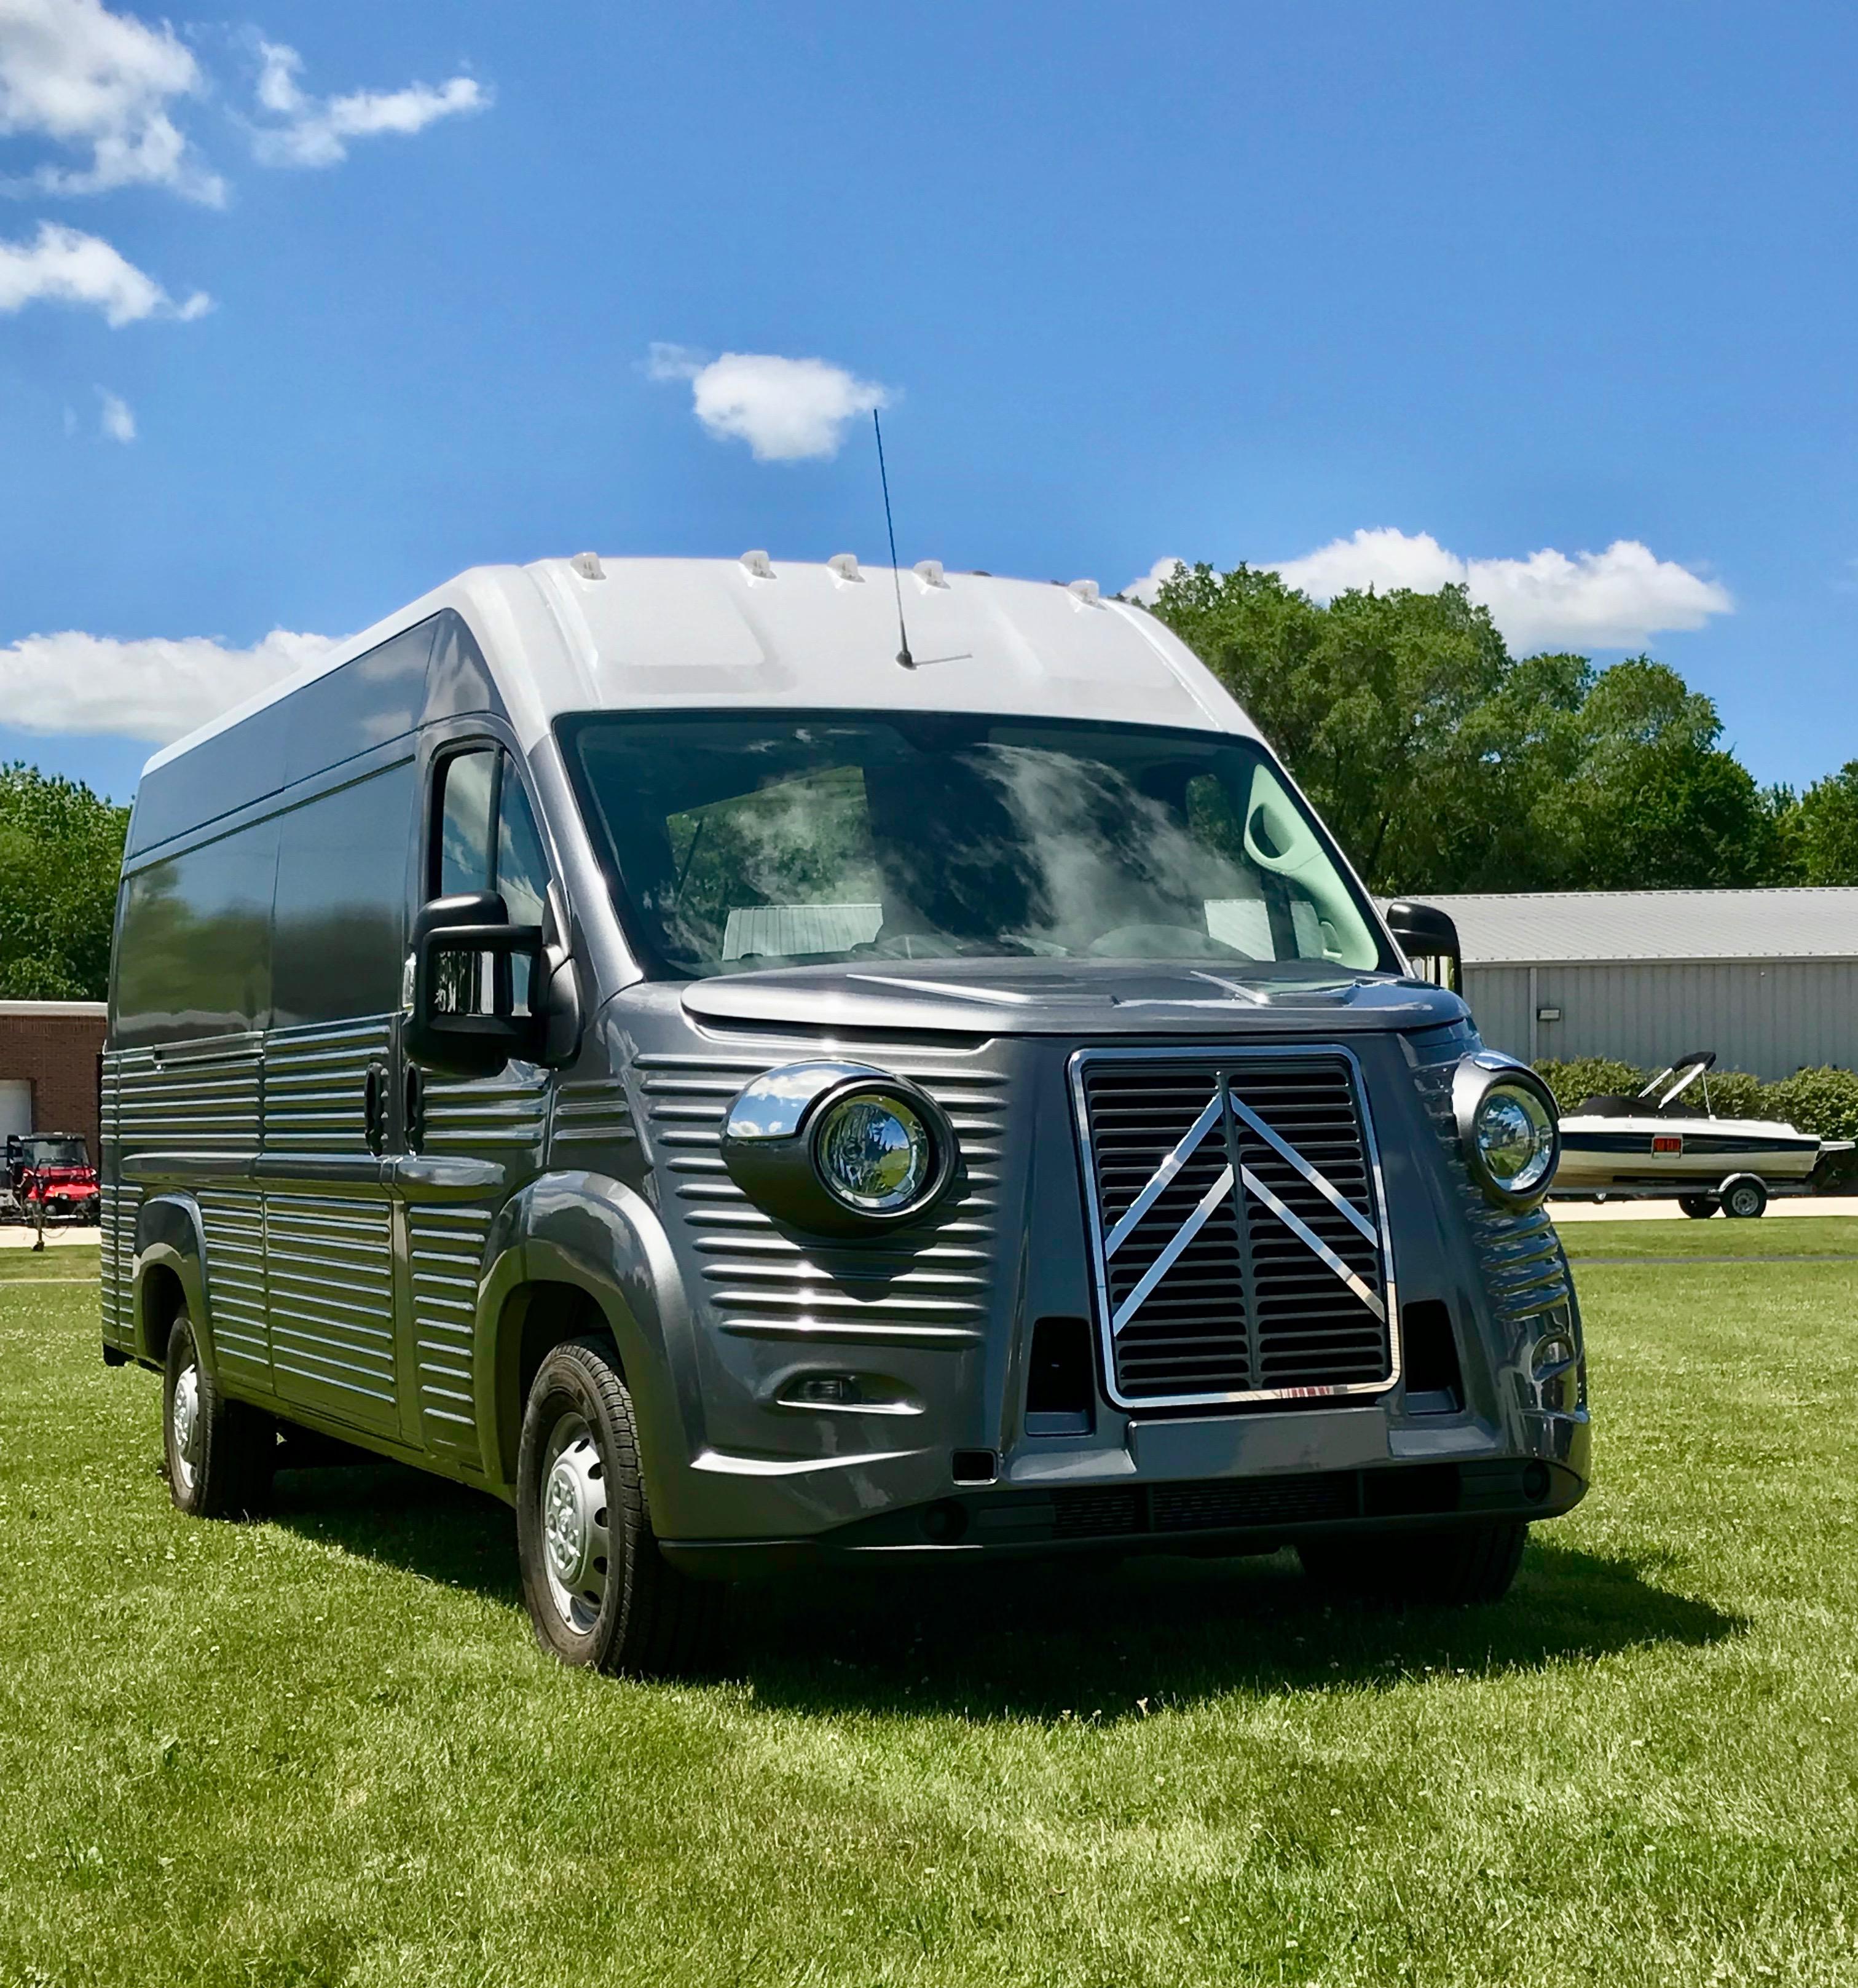 Citroen HY Van (Modern) front angle